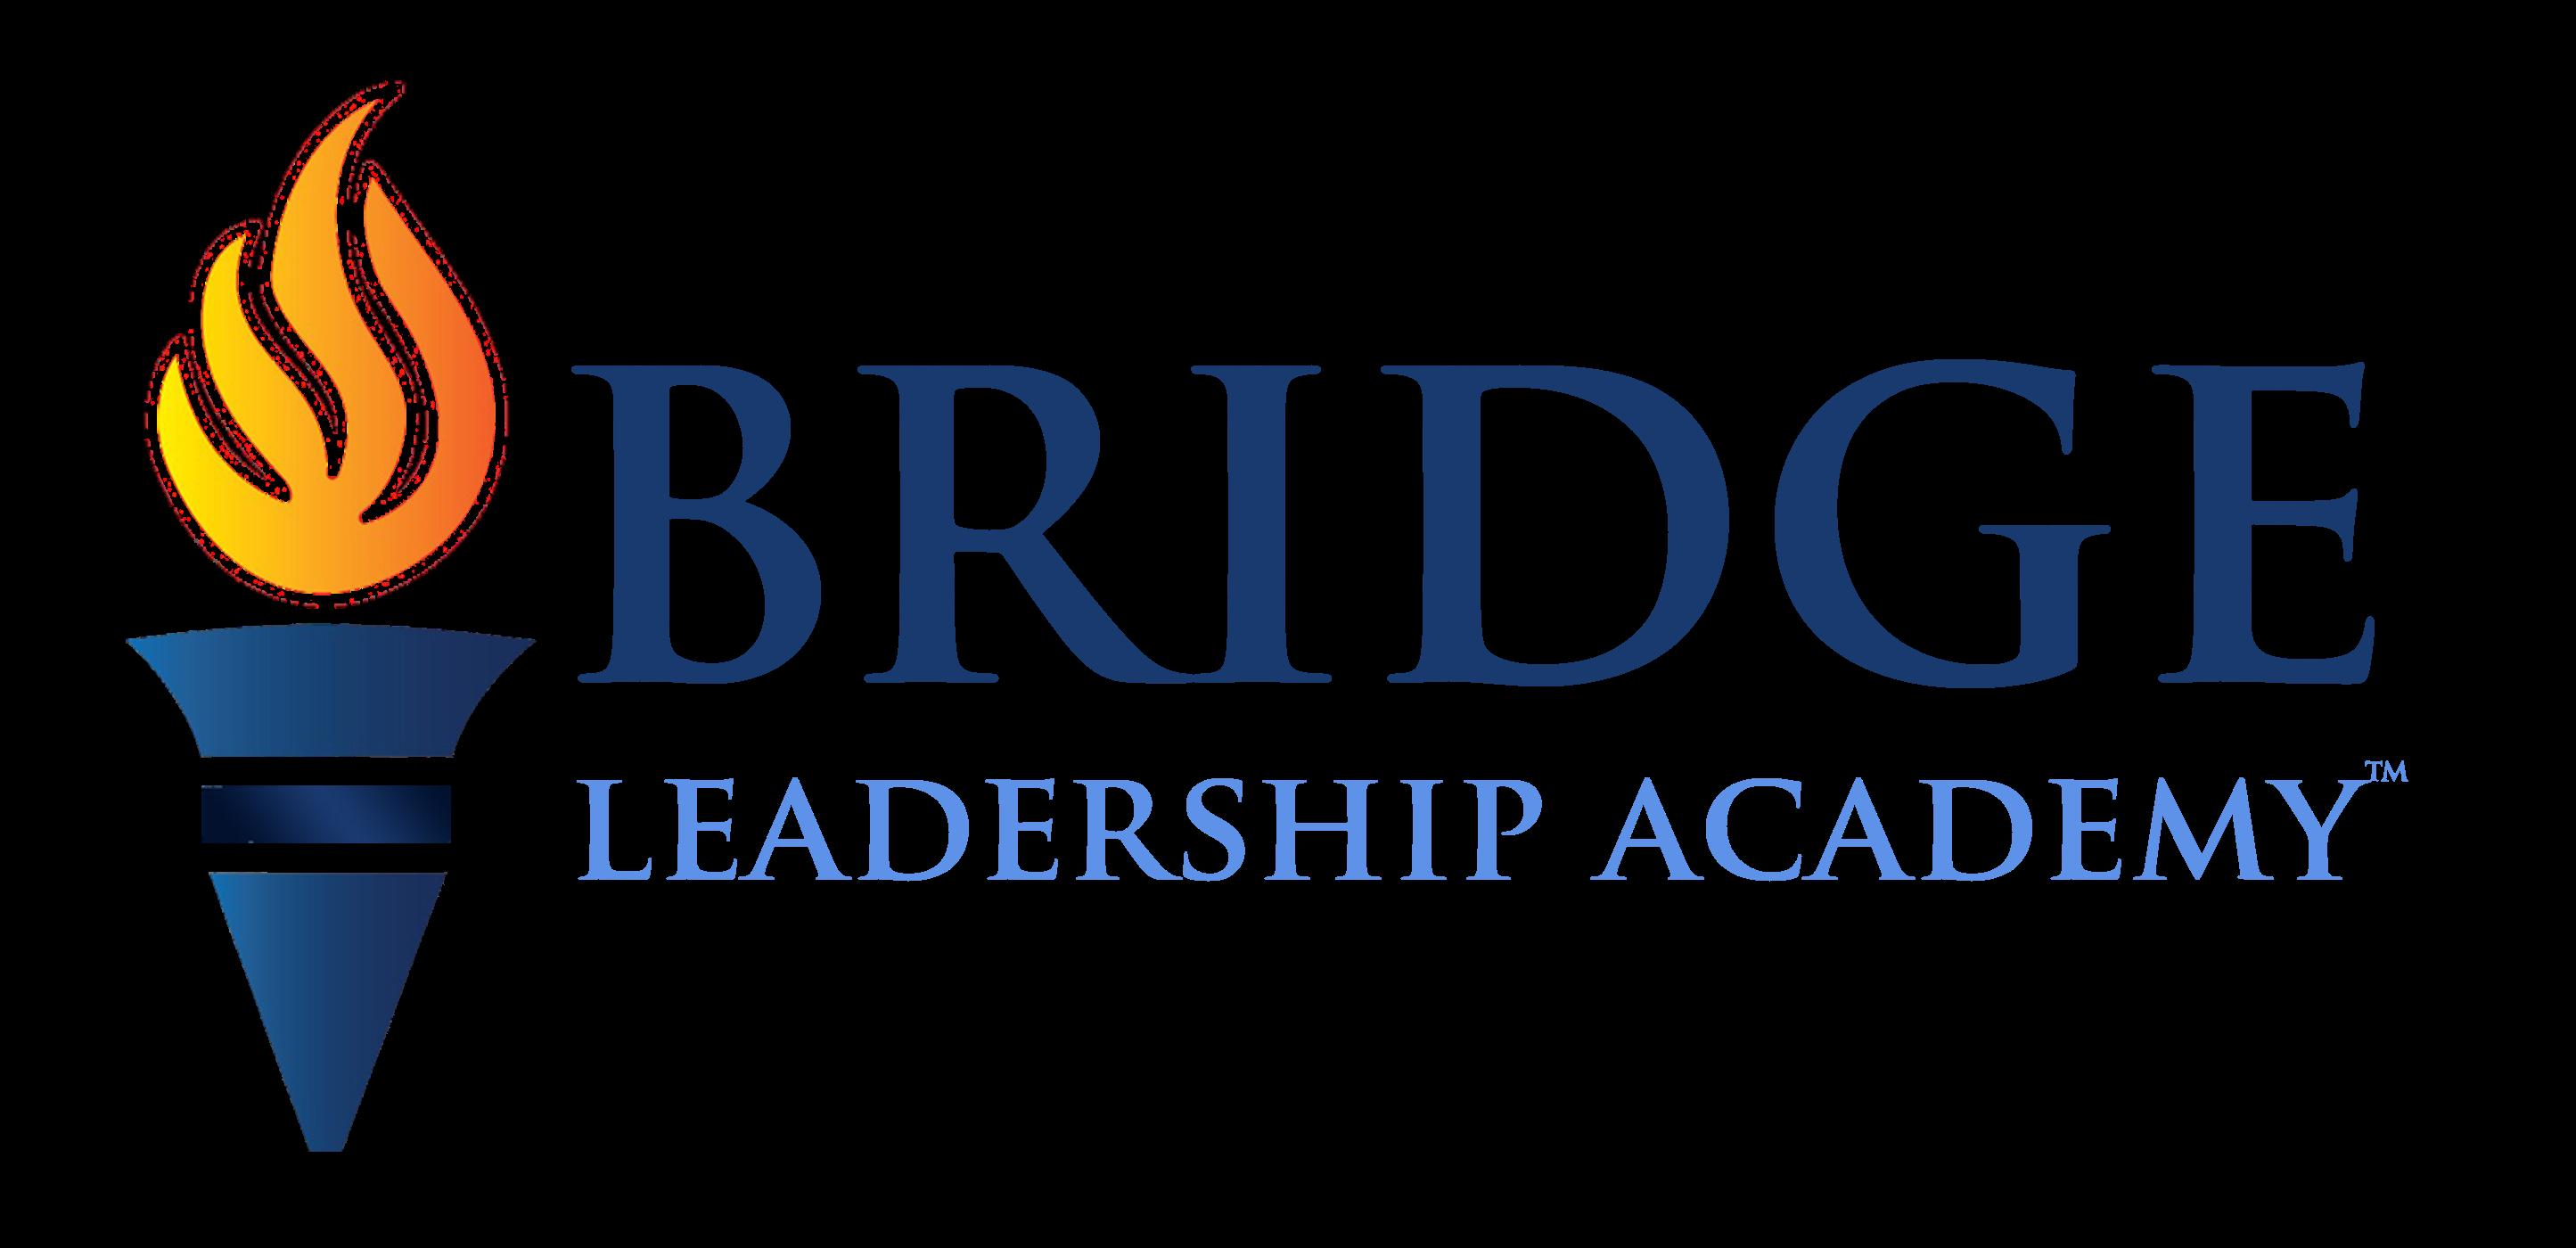 Bridge Leadership Academy